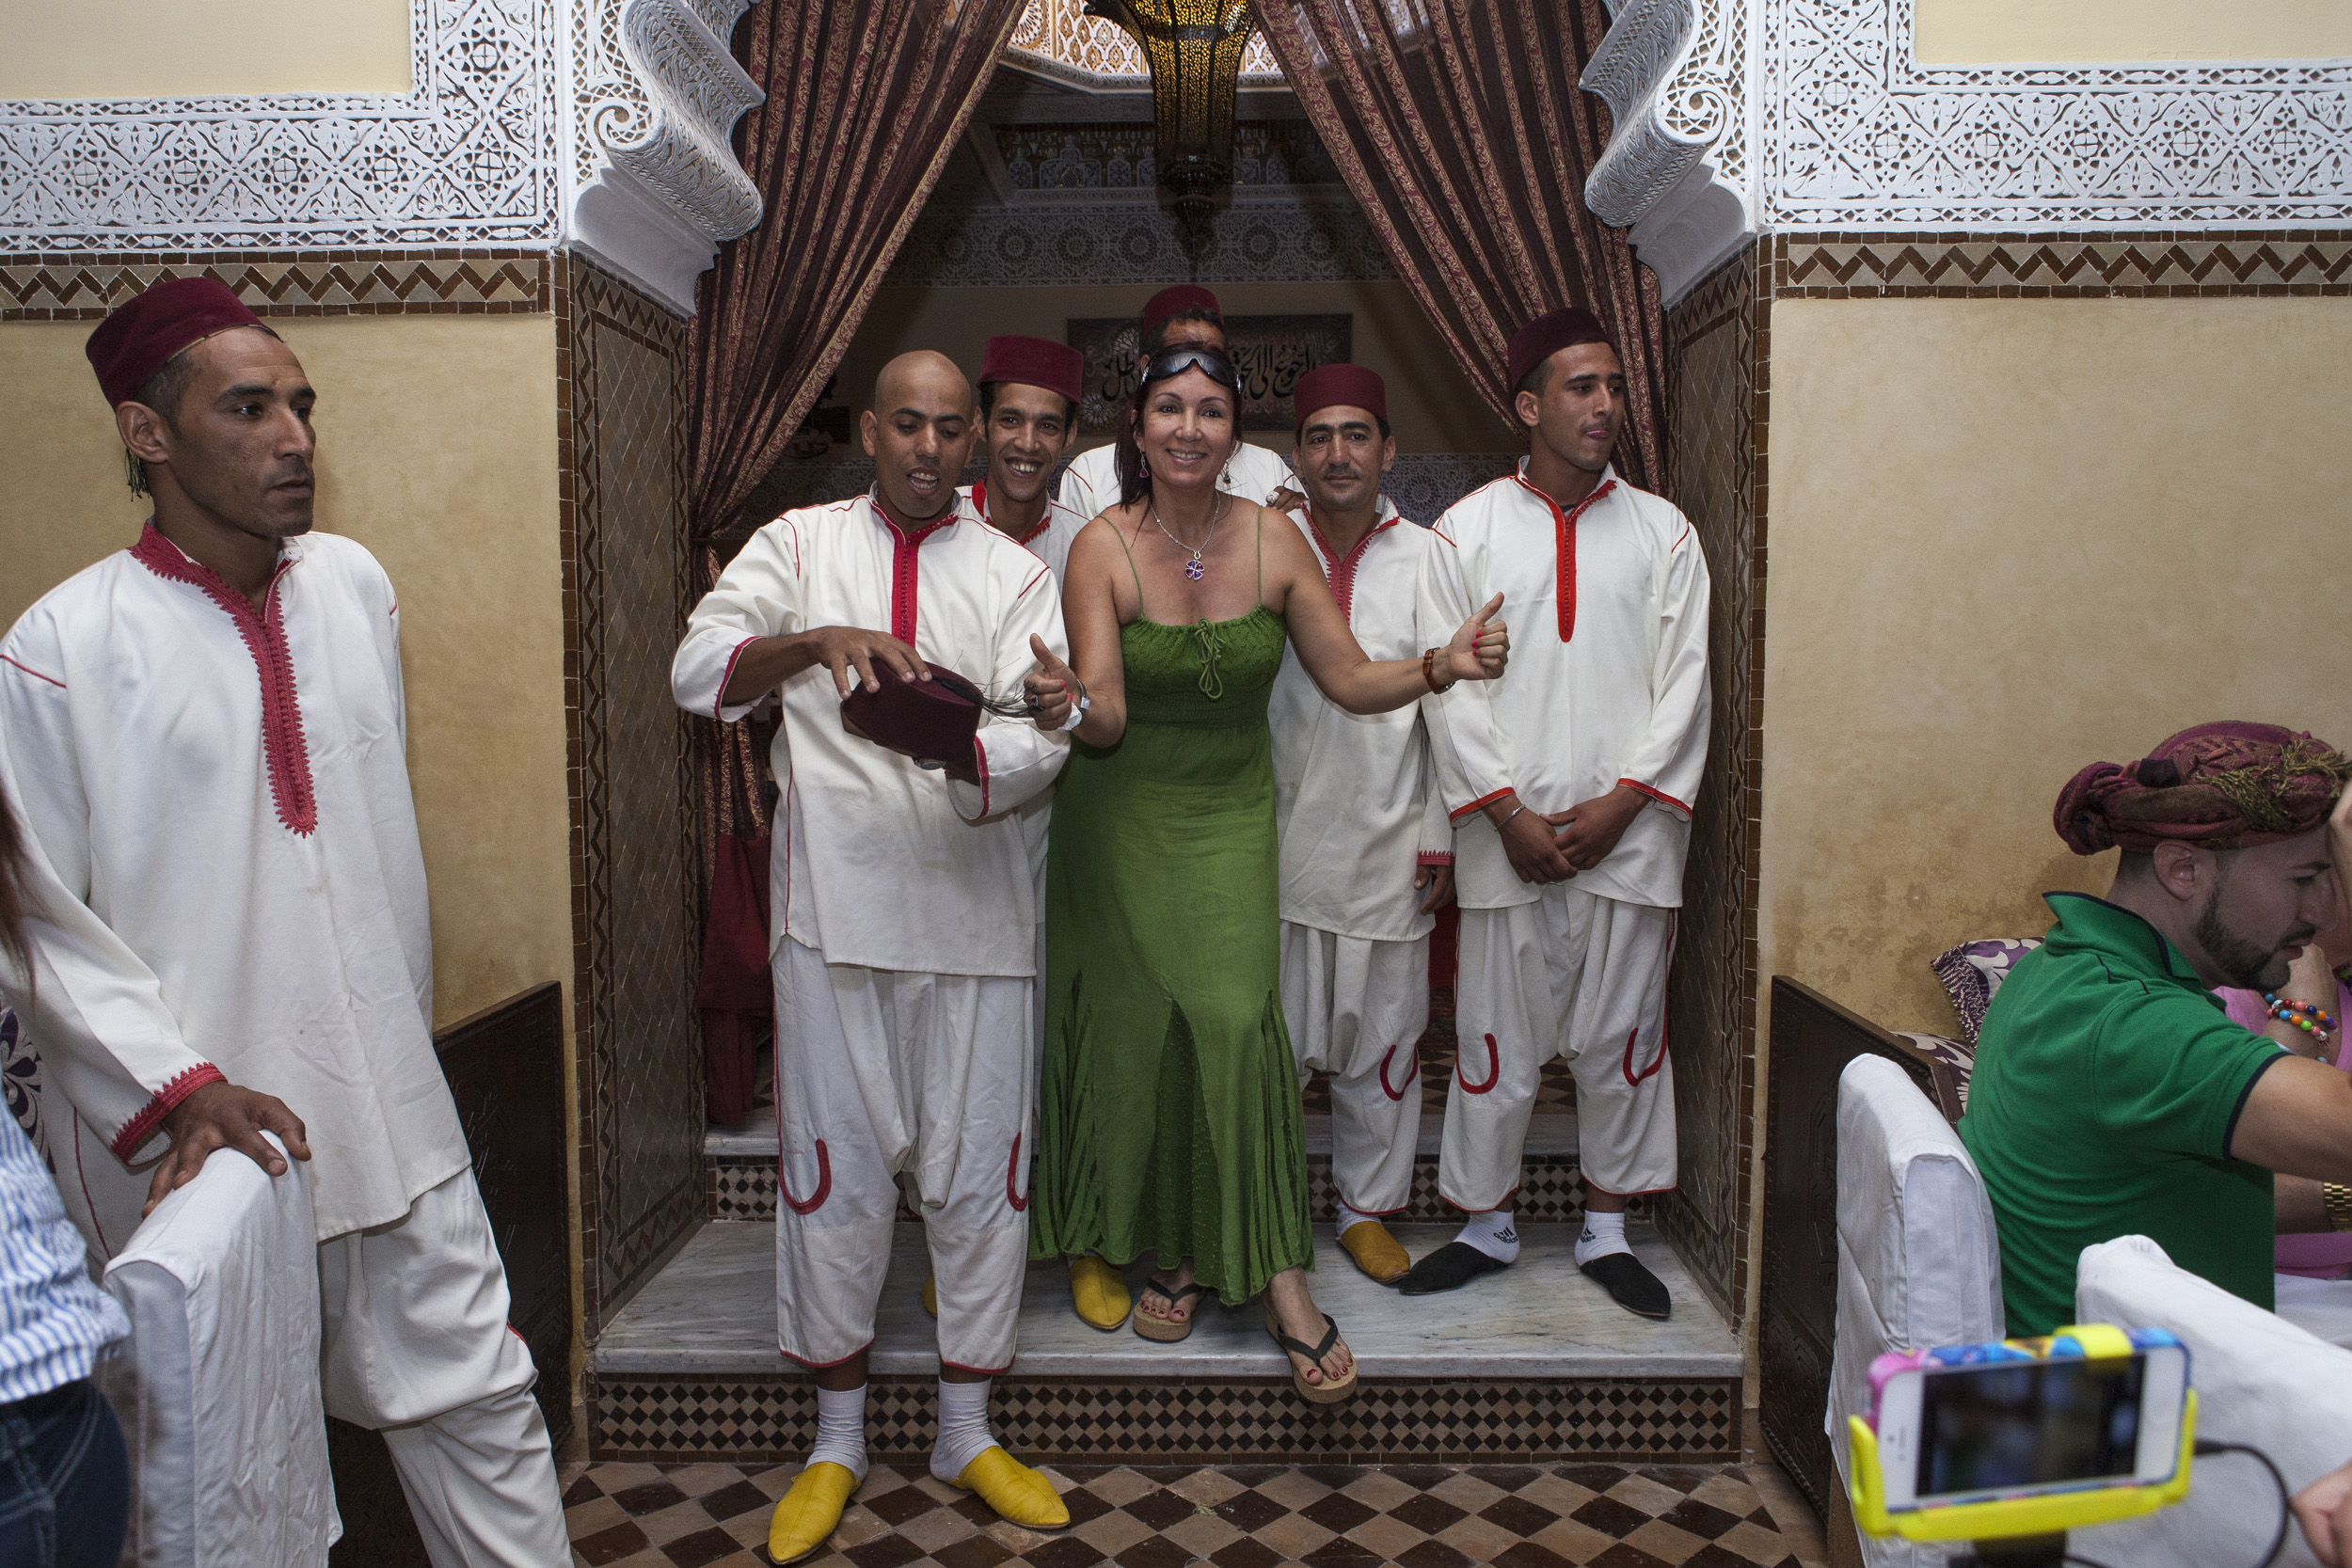 marrakech_2_convencion_anual_salerm_cosmetics_proline_11